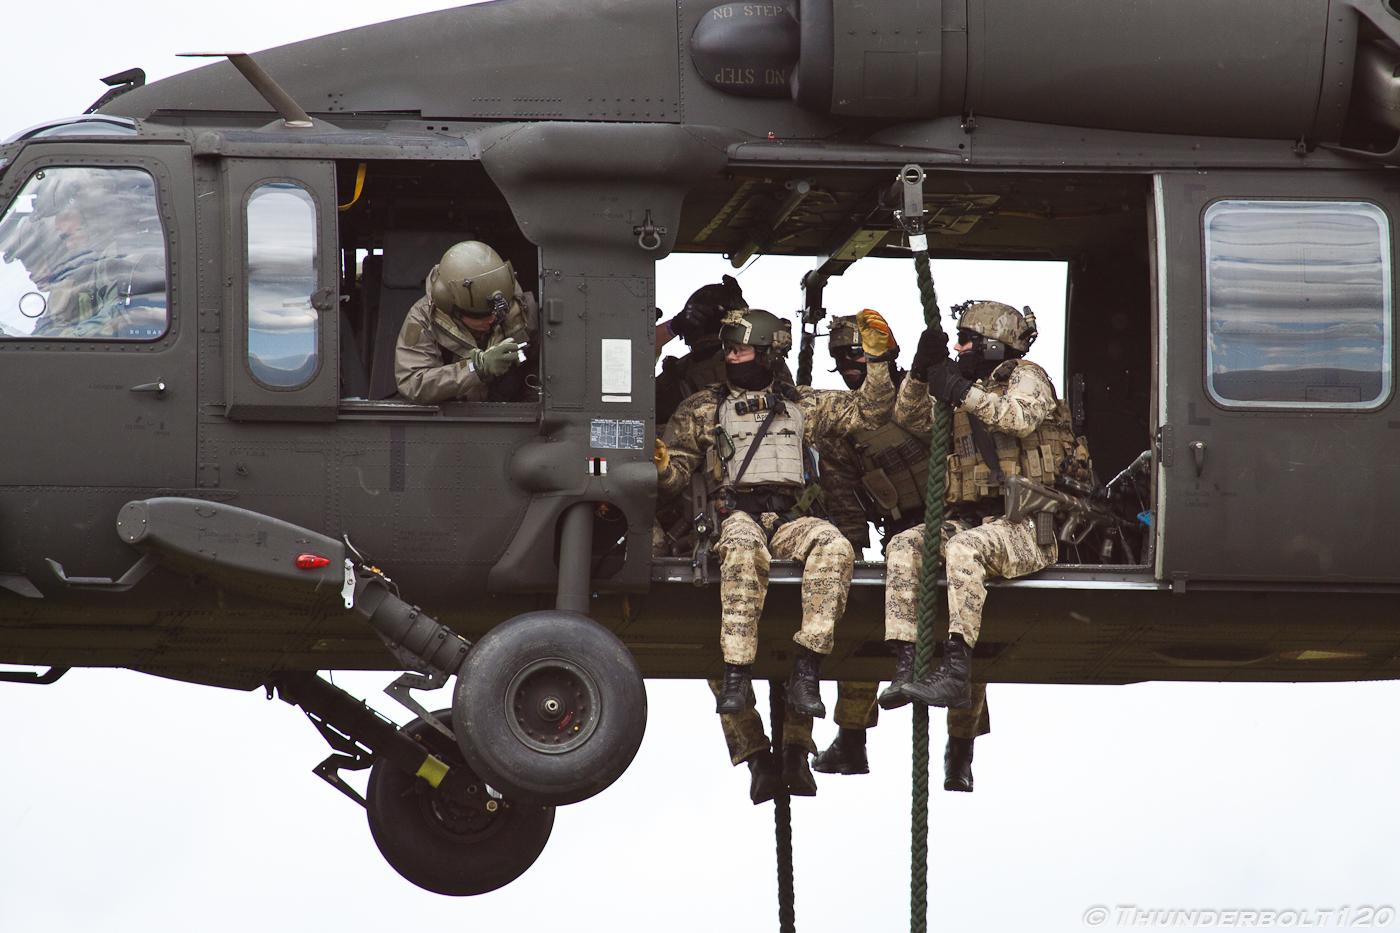 Sikorsky S-70A-42 Black Hawk